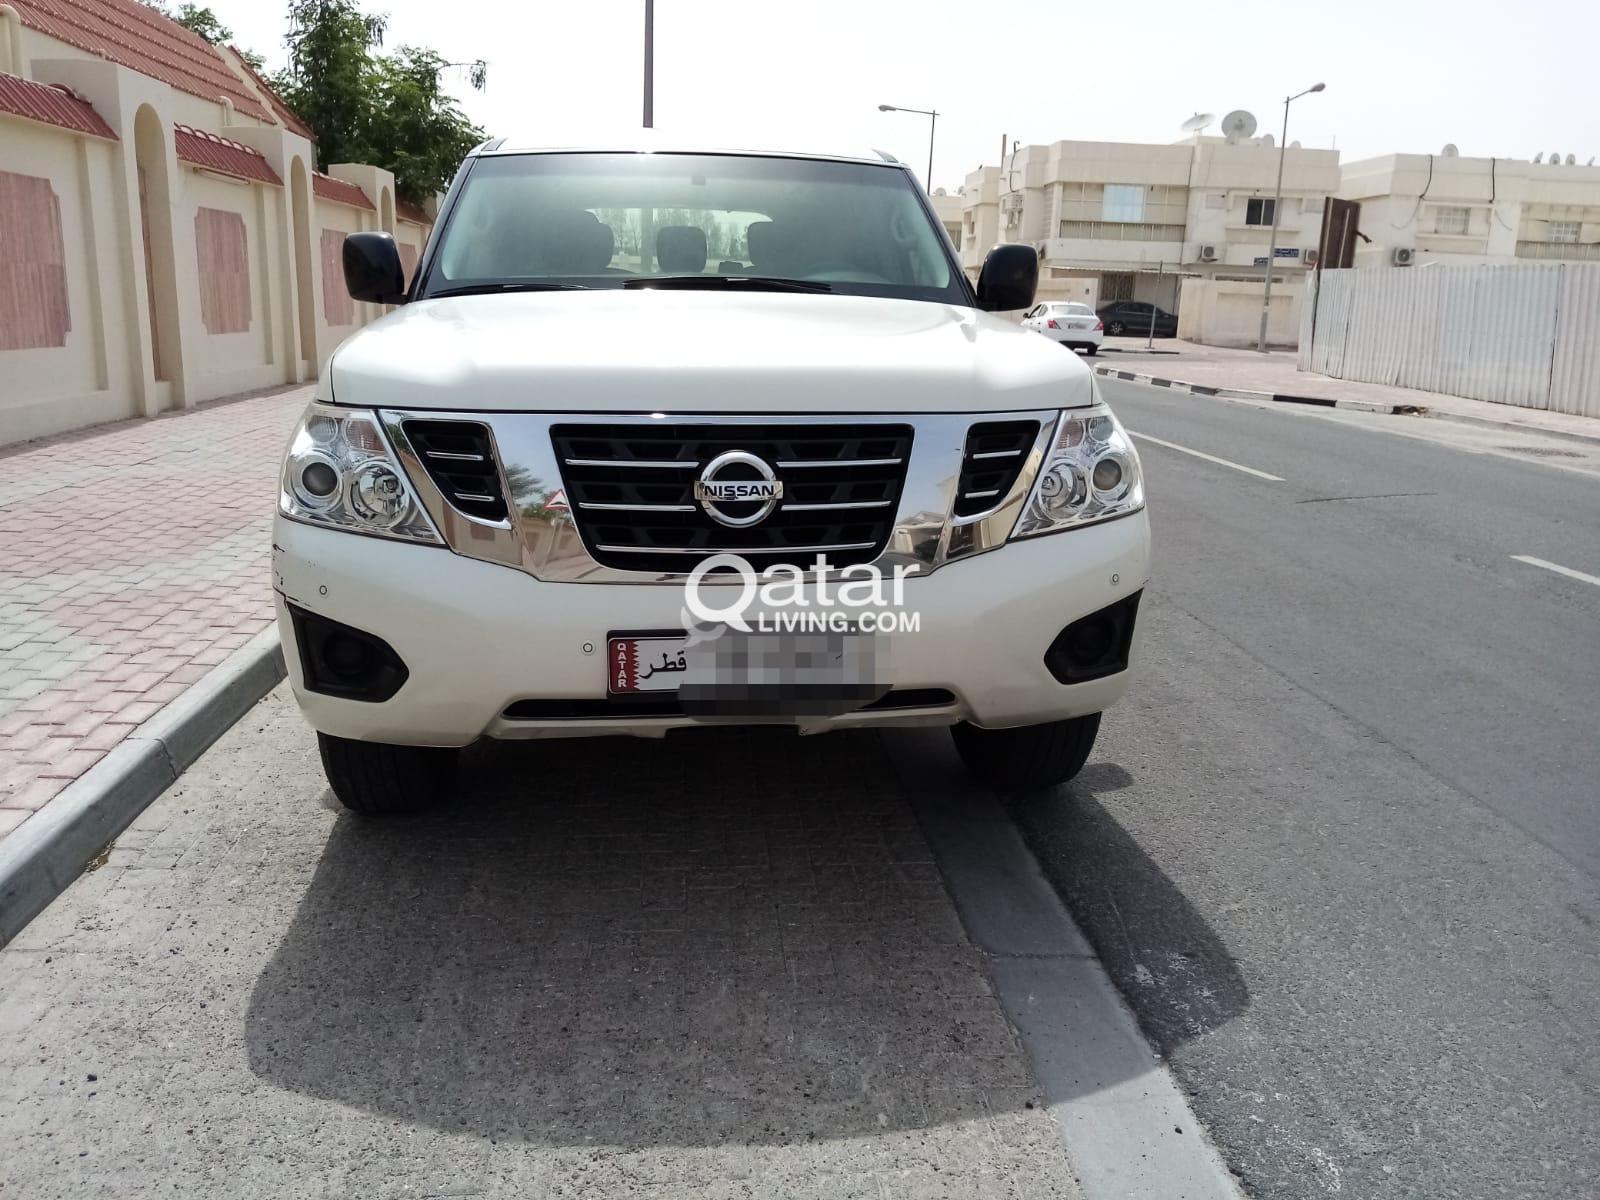 Nissan Patrol Xe For Sale On 07 05 2020 Qatar Living